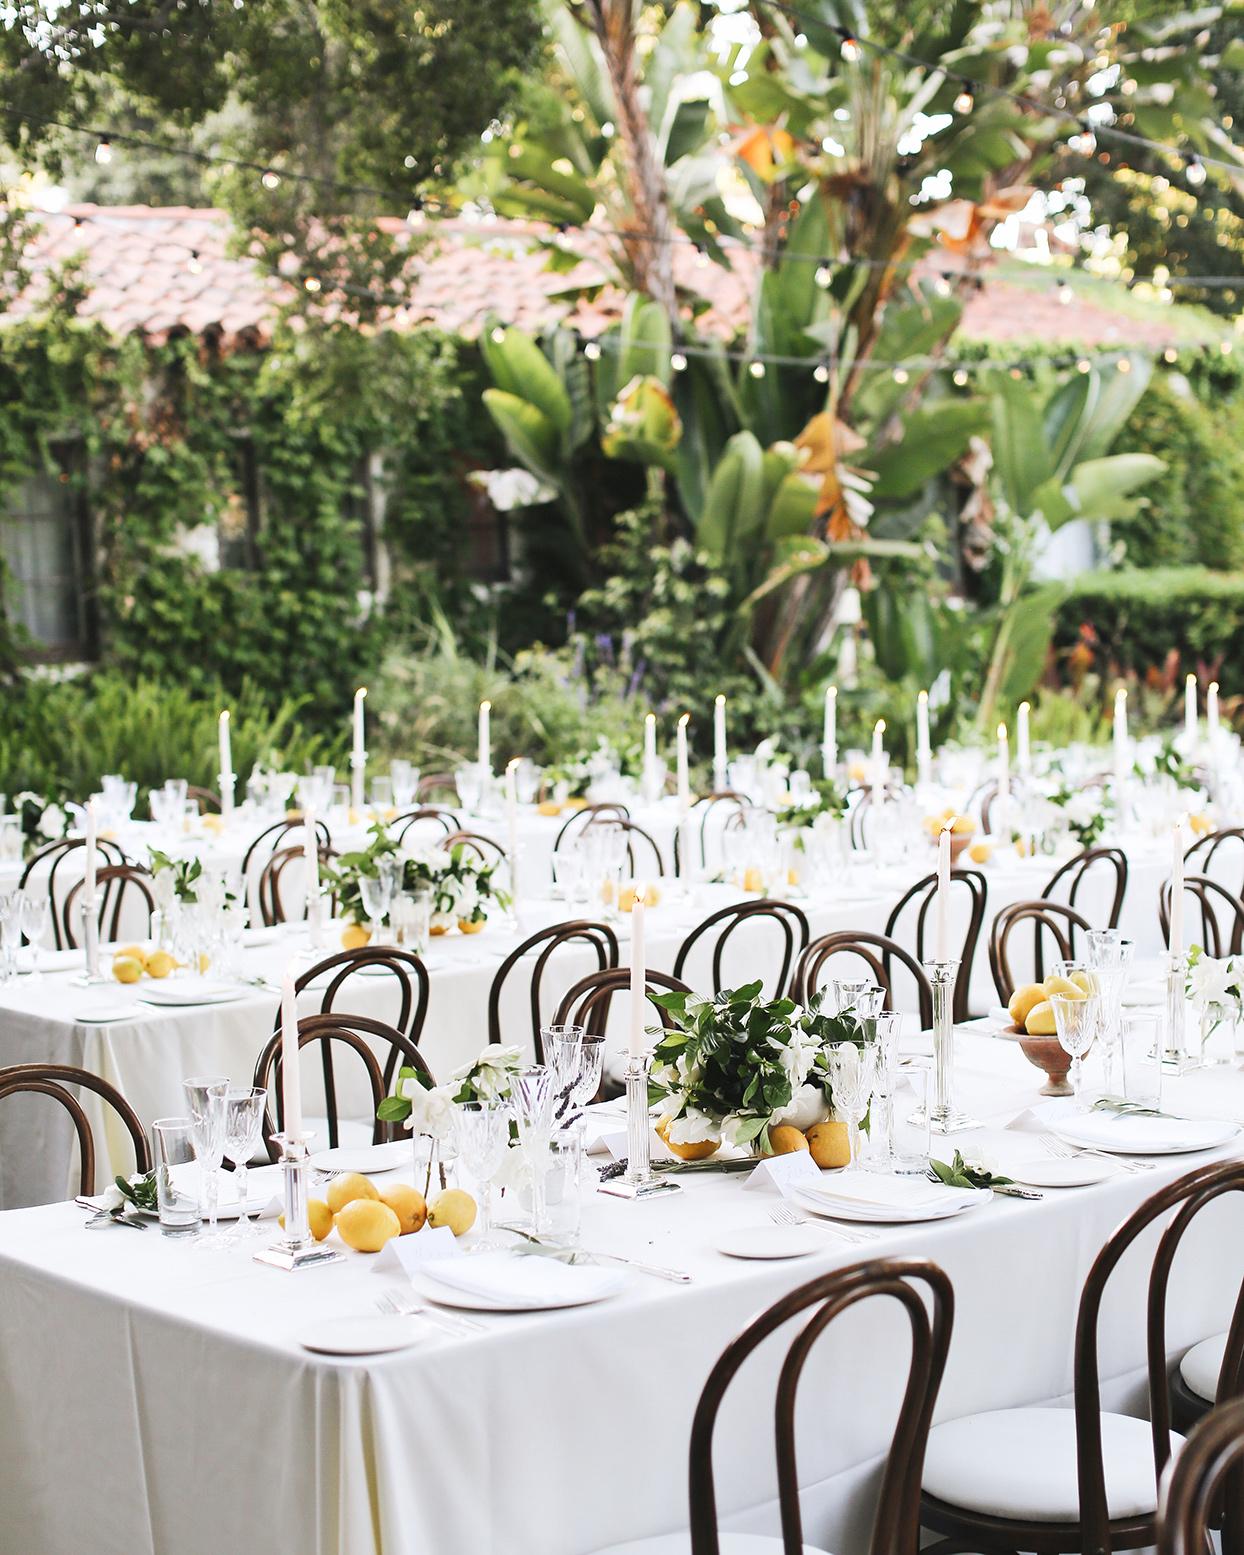 pia davide white wedding reception tables with lemon centerpieces